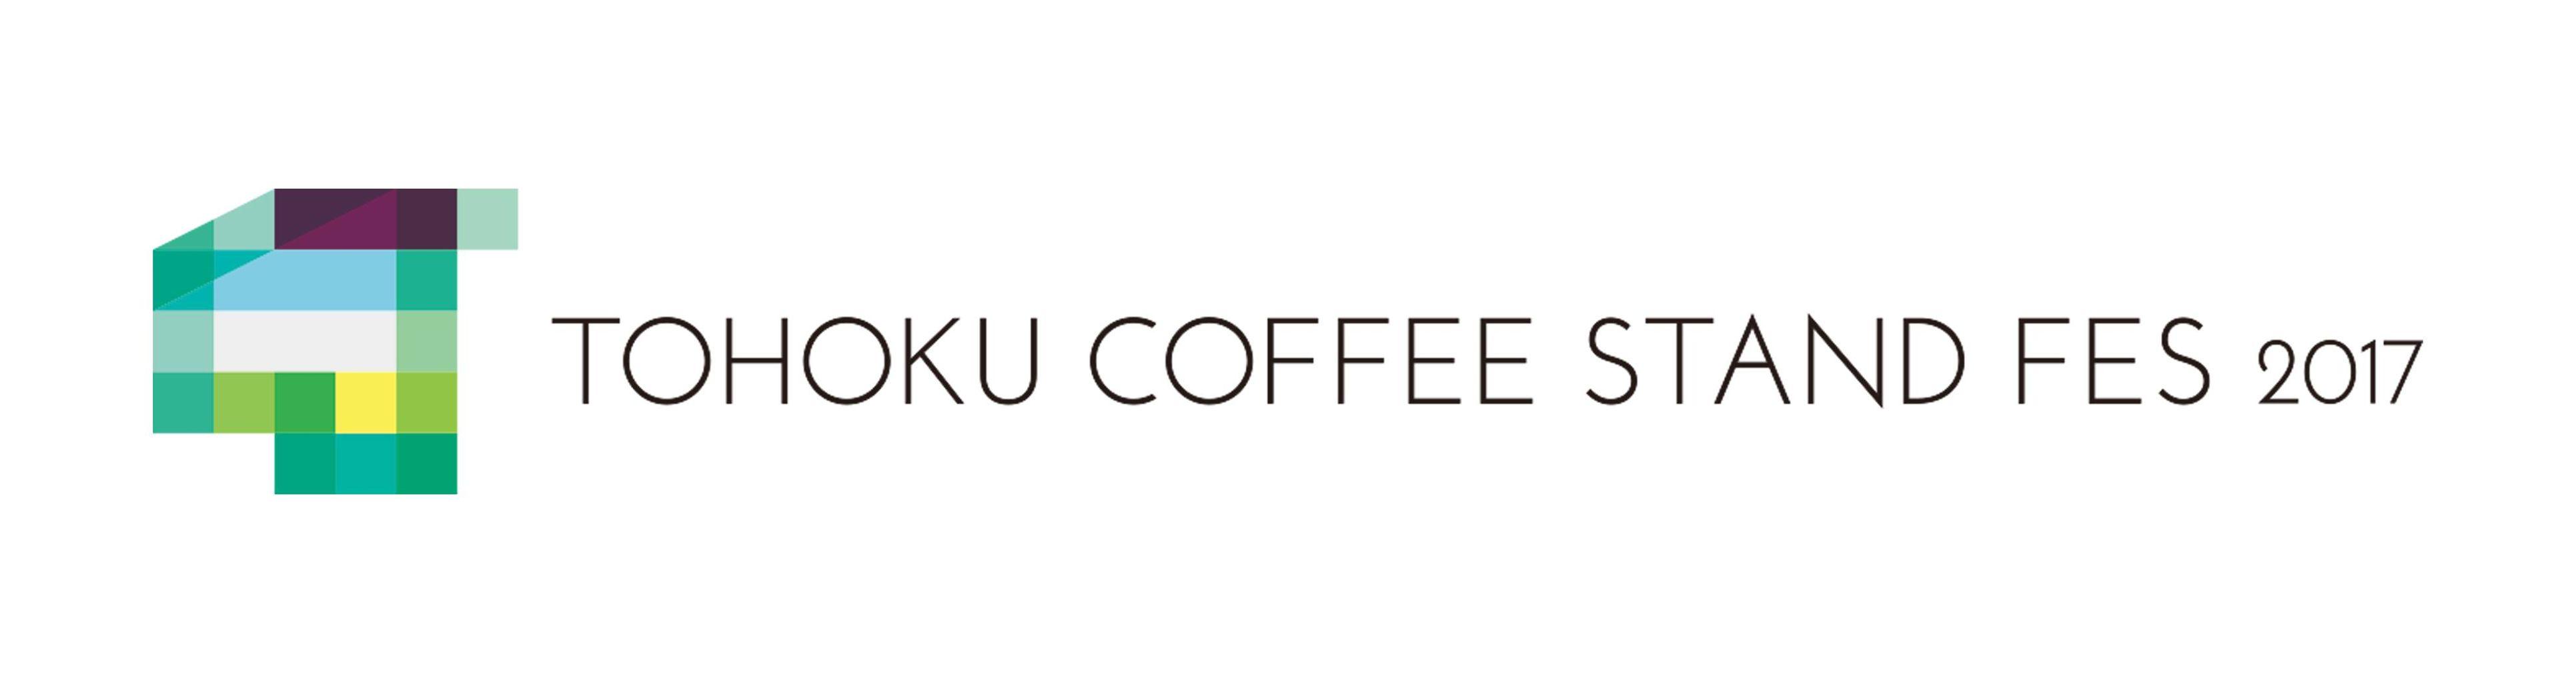 tohokucoffeestandfes